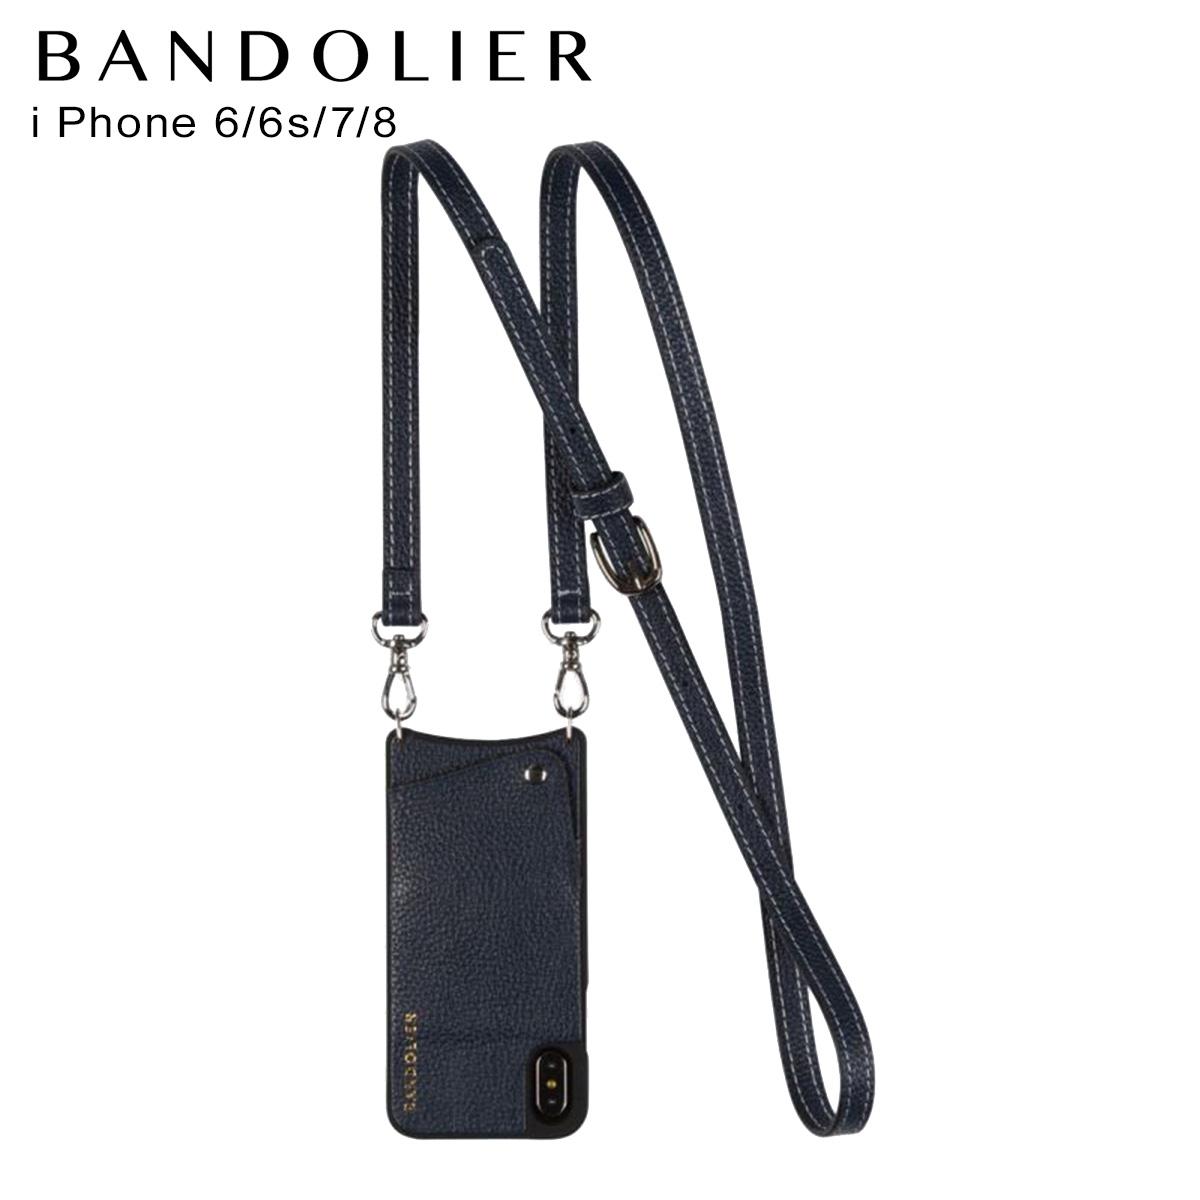 BANDOLIER バンドリヤー iPhone SE SE2 8 7 6s 6 ケース スマホ 携帯 アイフォン レディース CASEY NAVY ネイビー 10cas